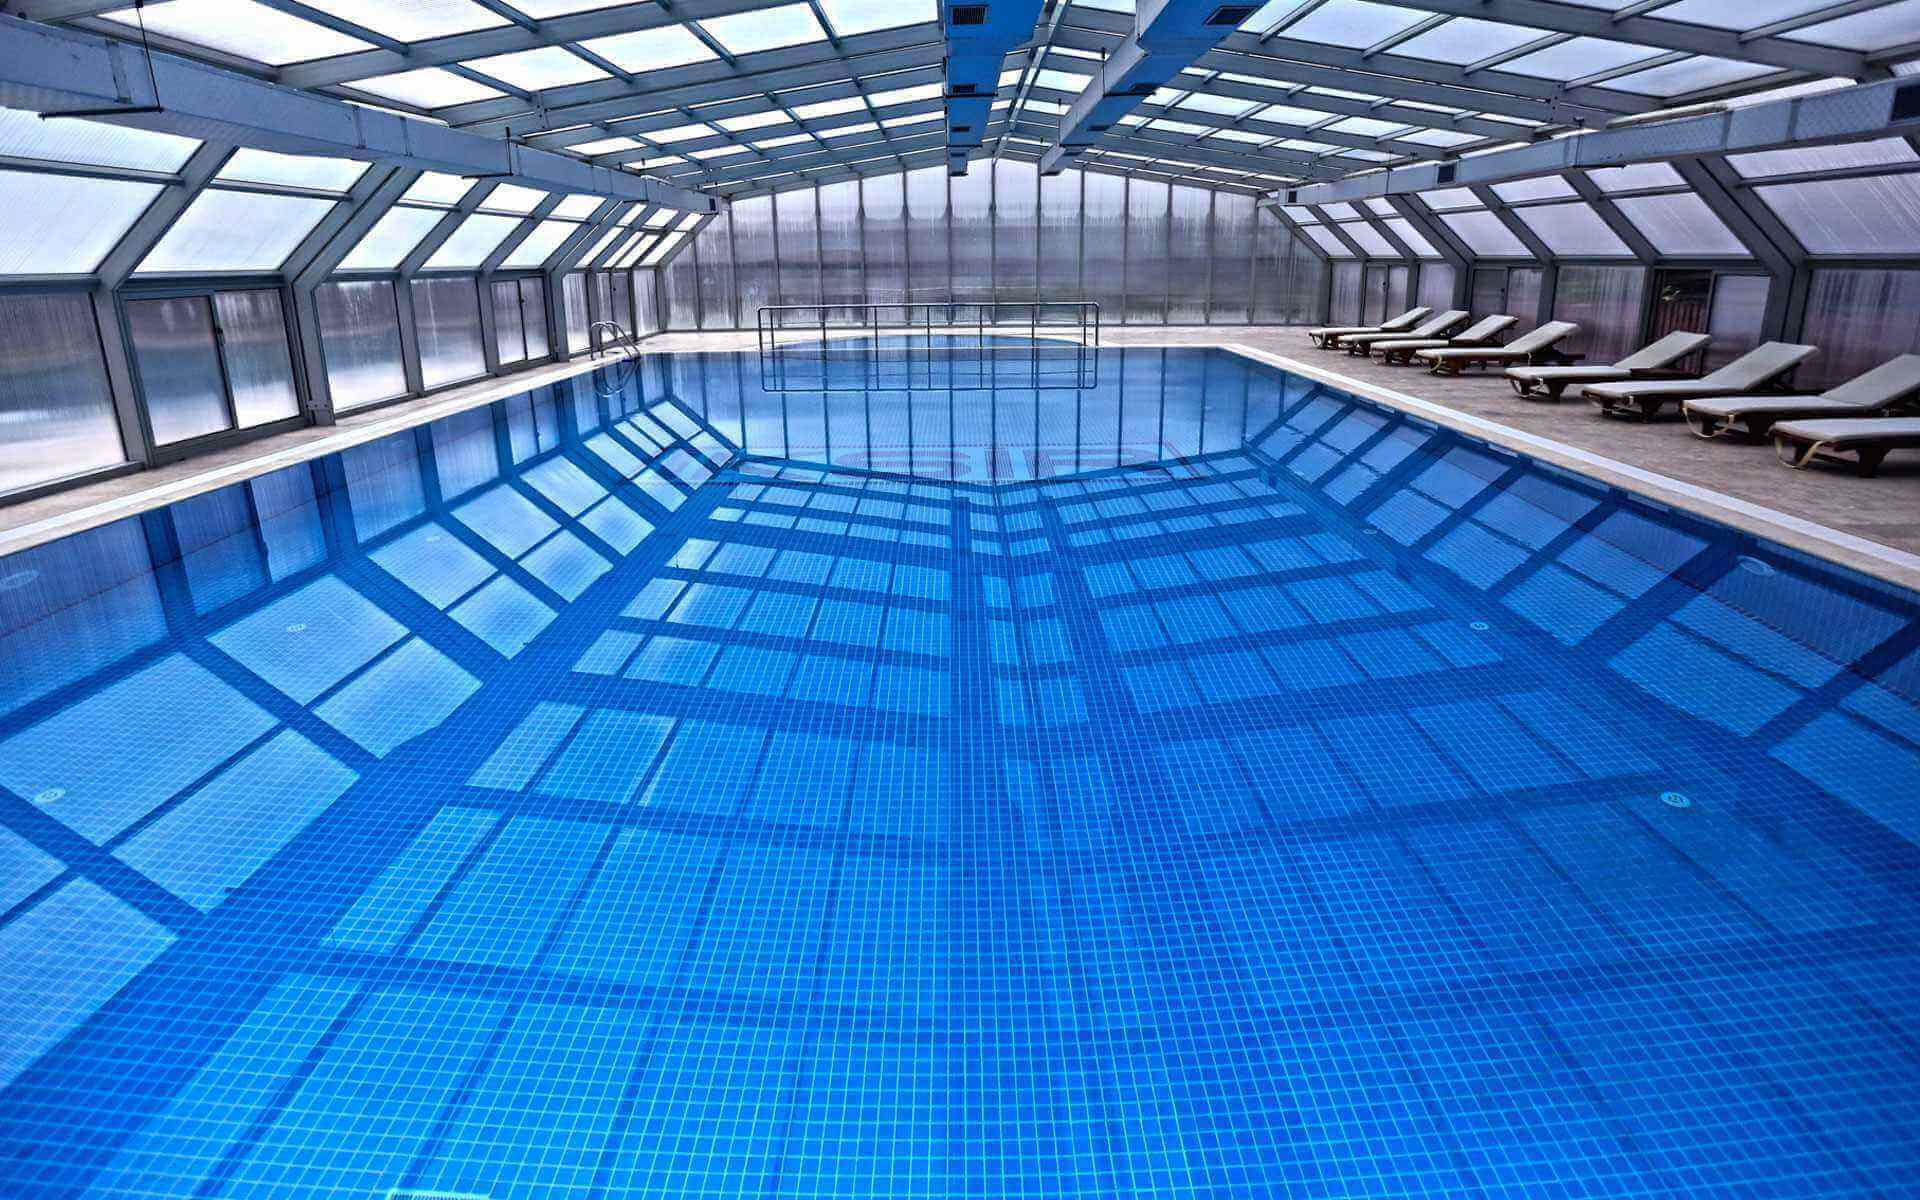 Kastamonu Daday Kapalı Yüzme Havuzu